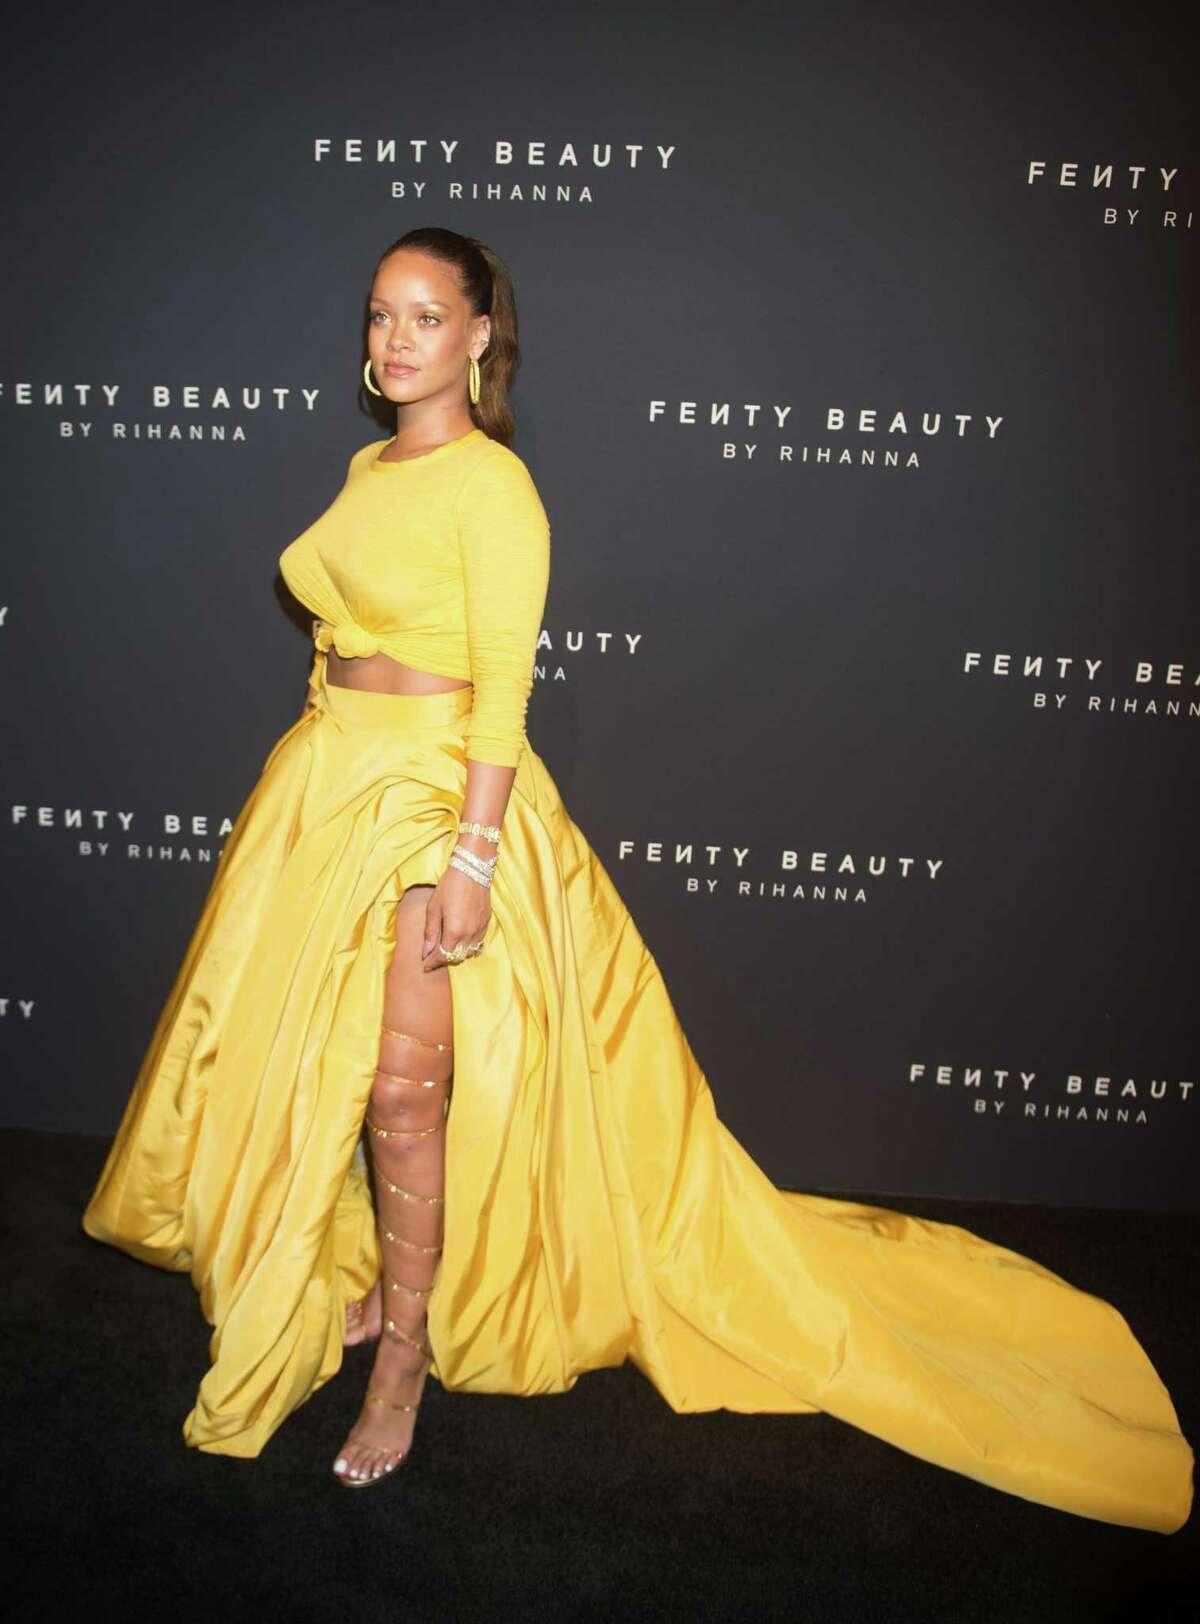 Rihanna arrives to celebrate the launch of her beauty brand, Fenty Beauty by Rihanna.